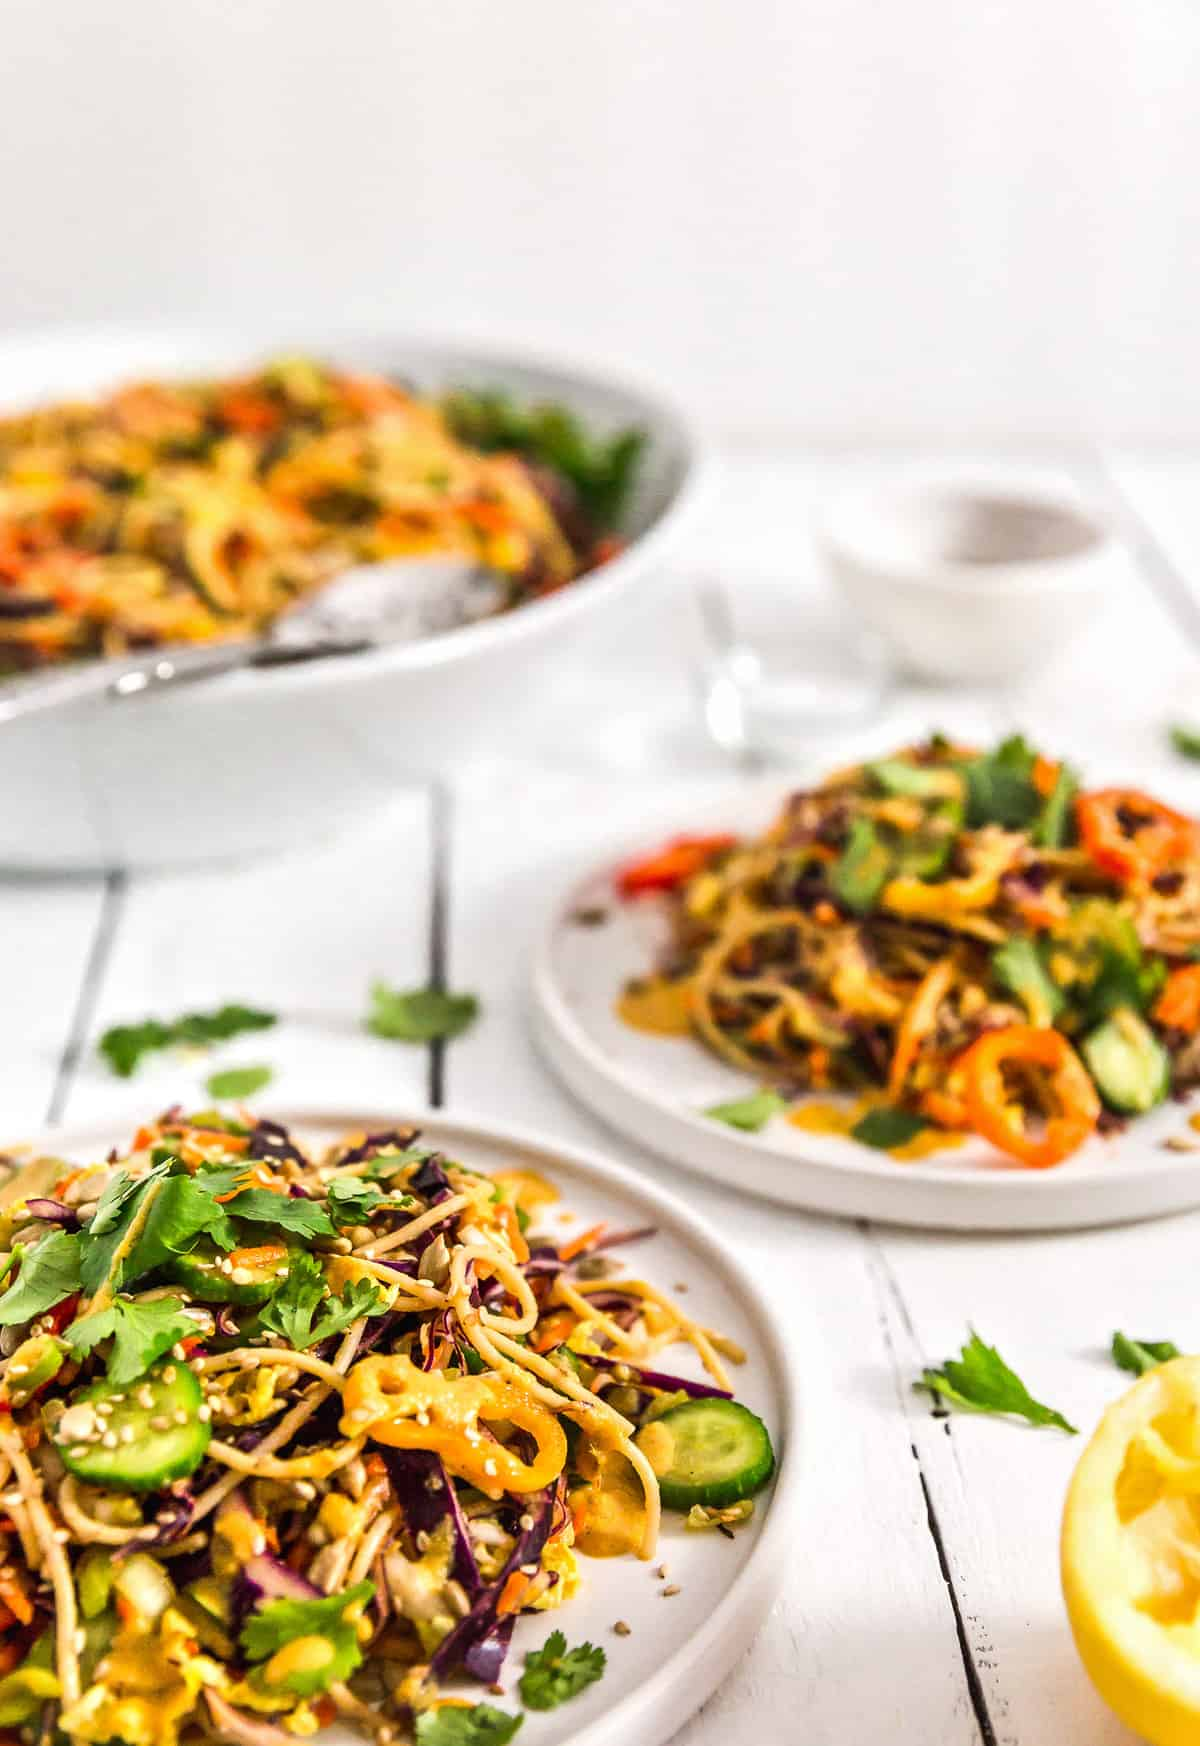 Asian Noodle Salad, noodle salad, plant based, vegan, vegetarian, whole food plant based, gluten free, recipe, wfpb, healthy, healthy vegan, oil free, no refined sugar, no oil, refined sugar free, dairy free, salad, noodles, pasta